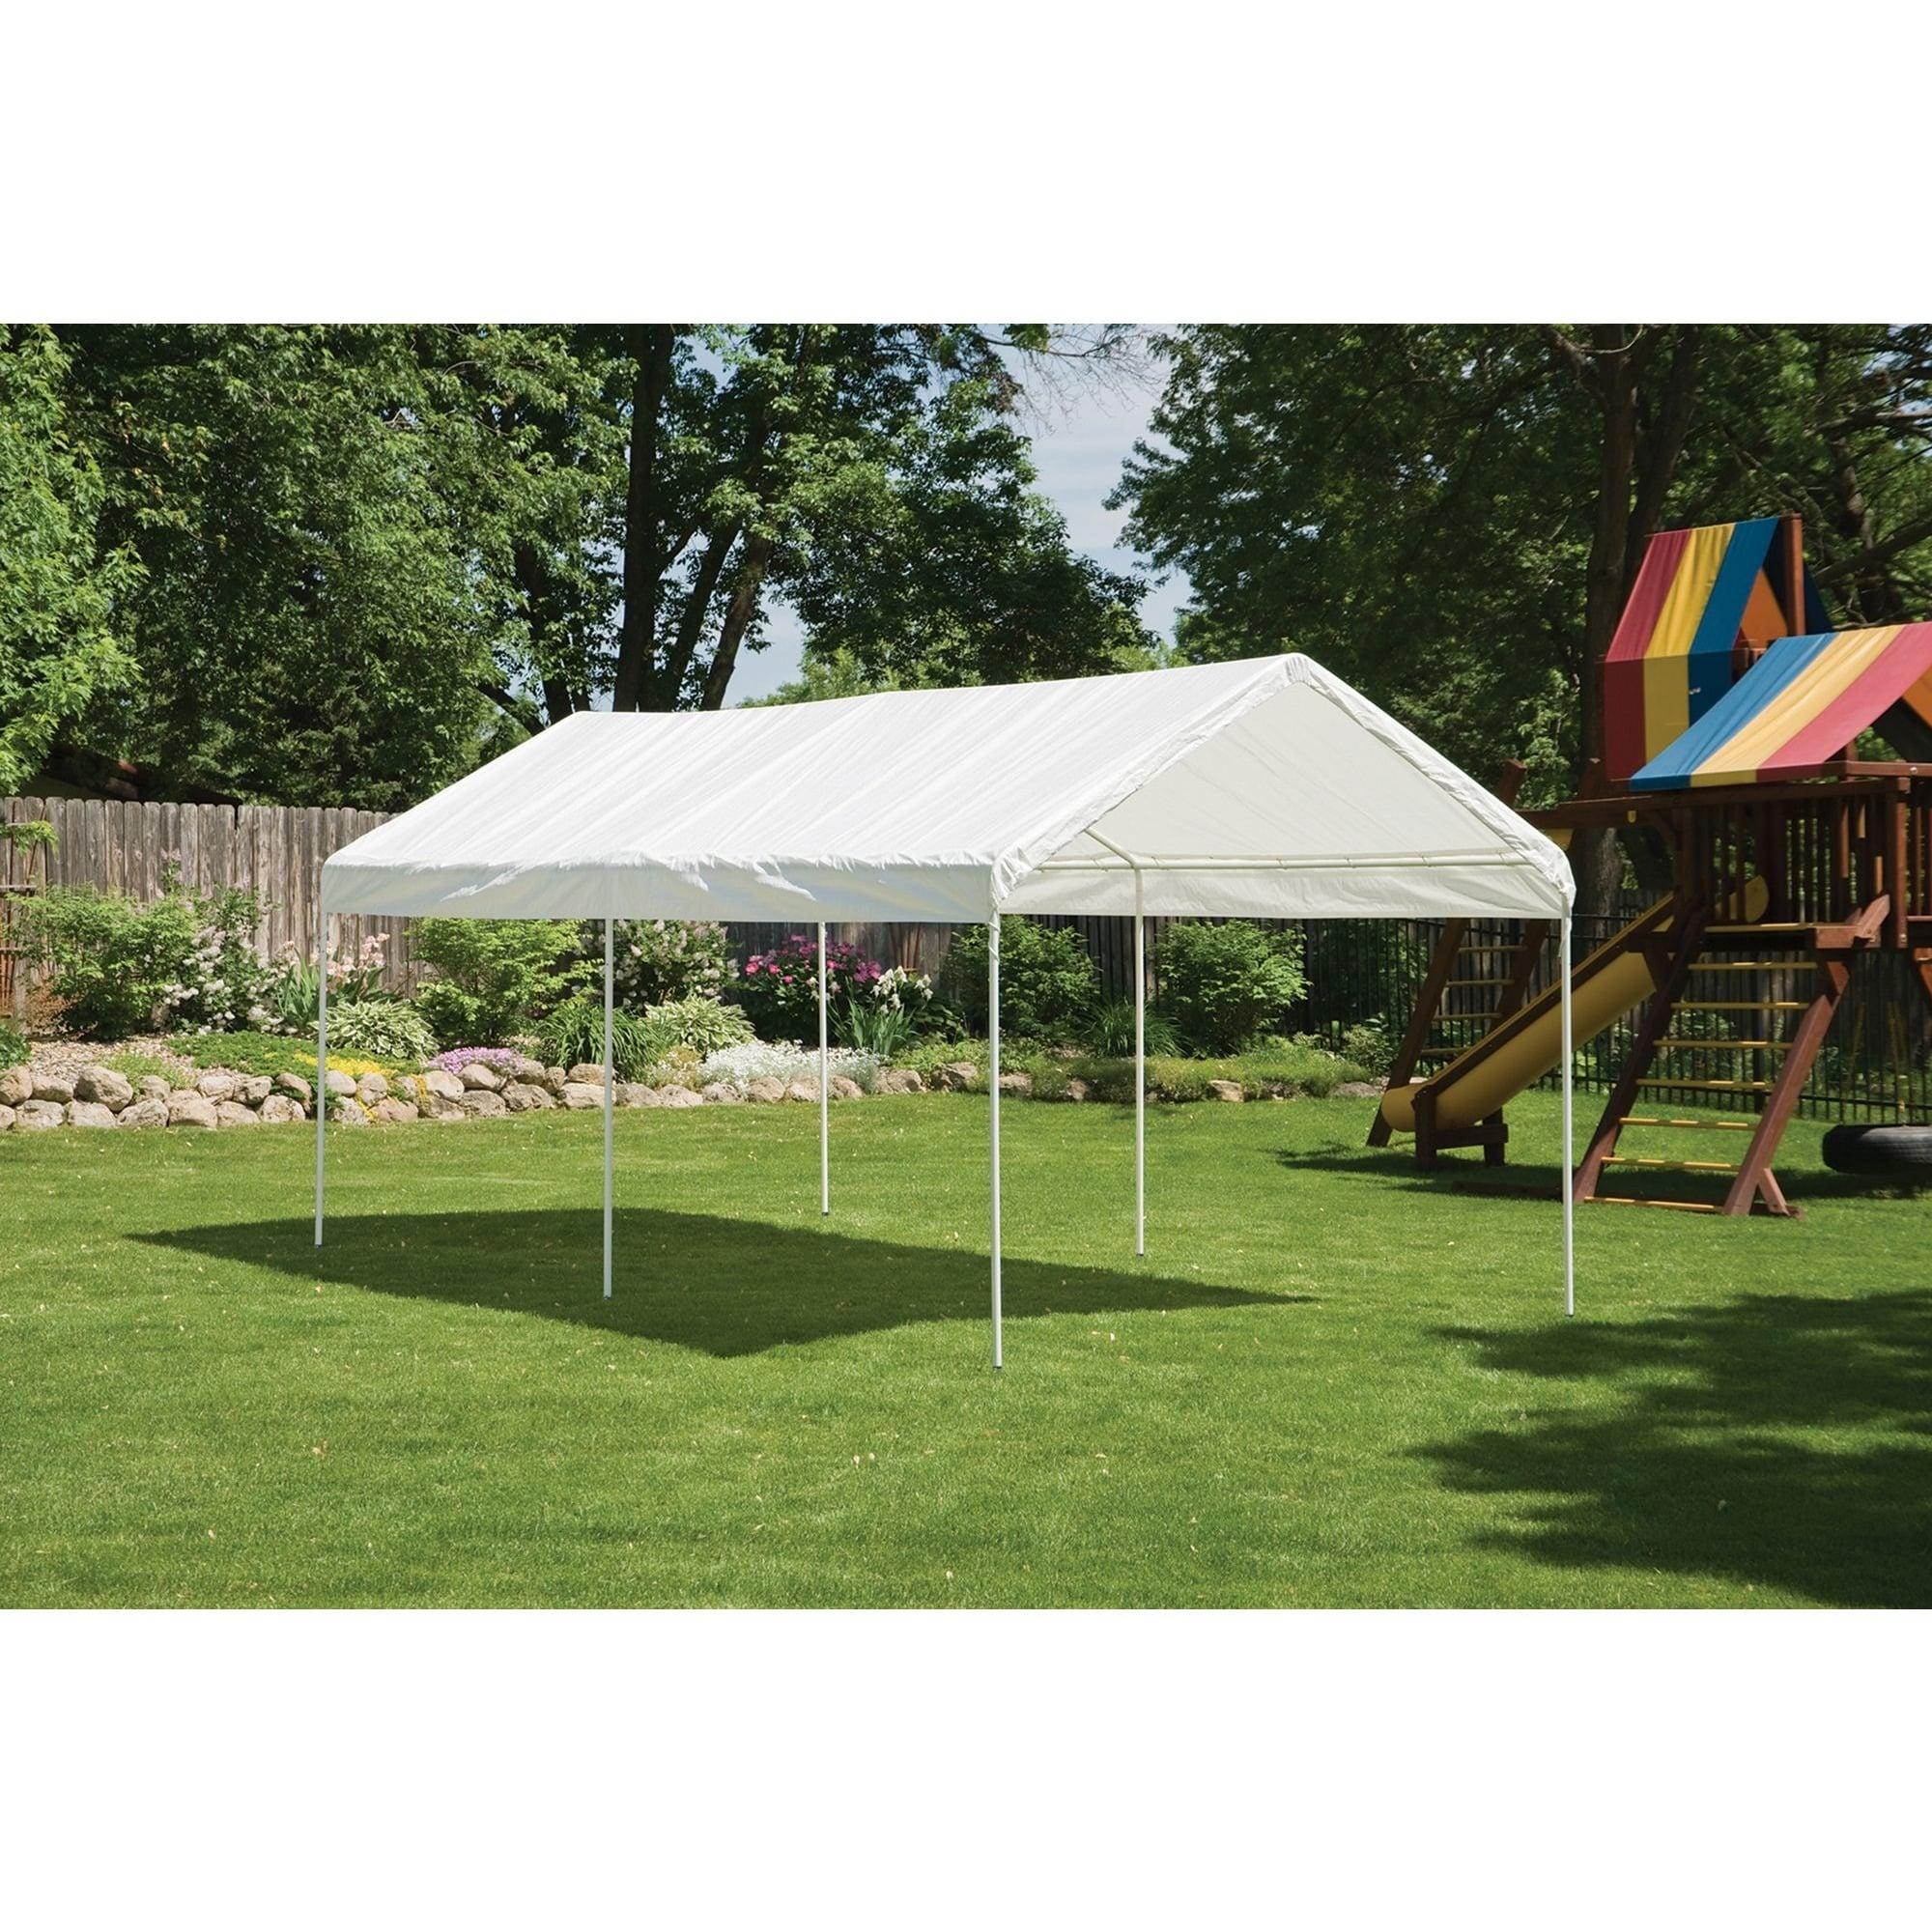 ShelterLogic White Cover 10' x 20' 6-leg Frame Canopy - Free ... on